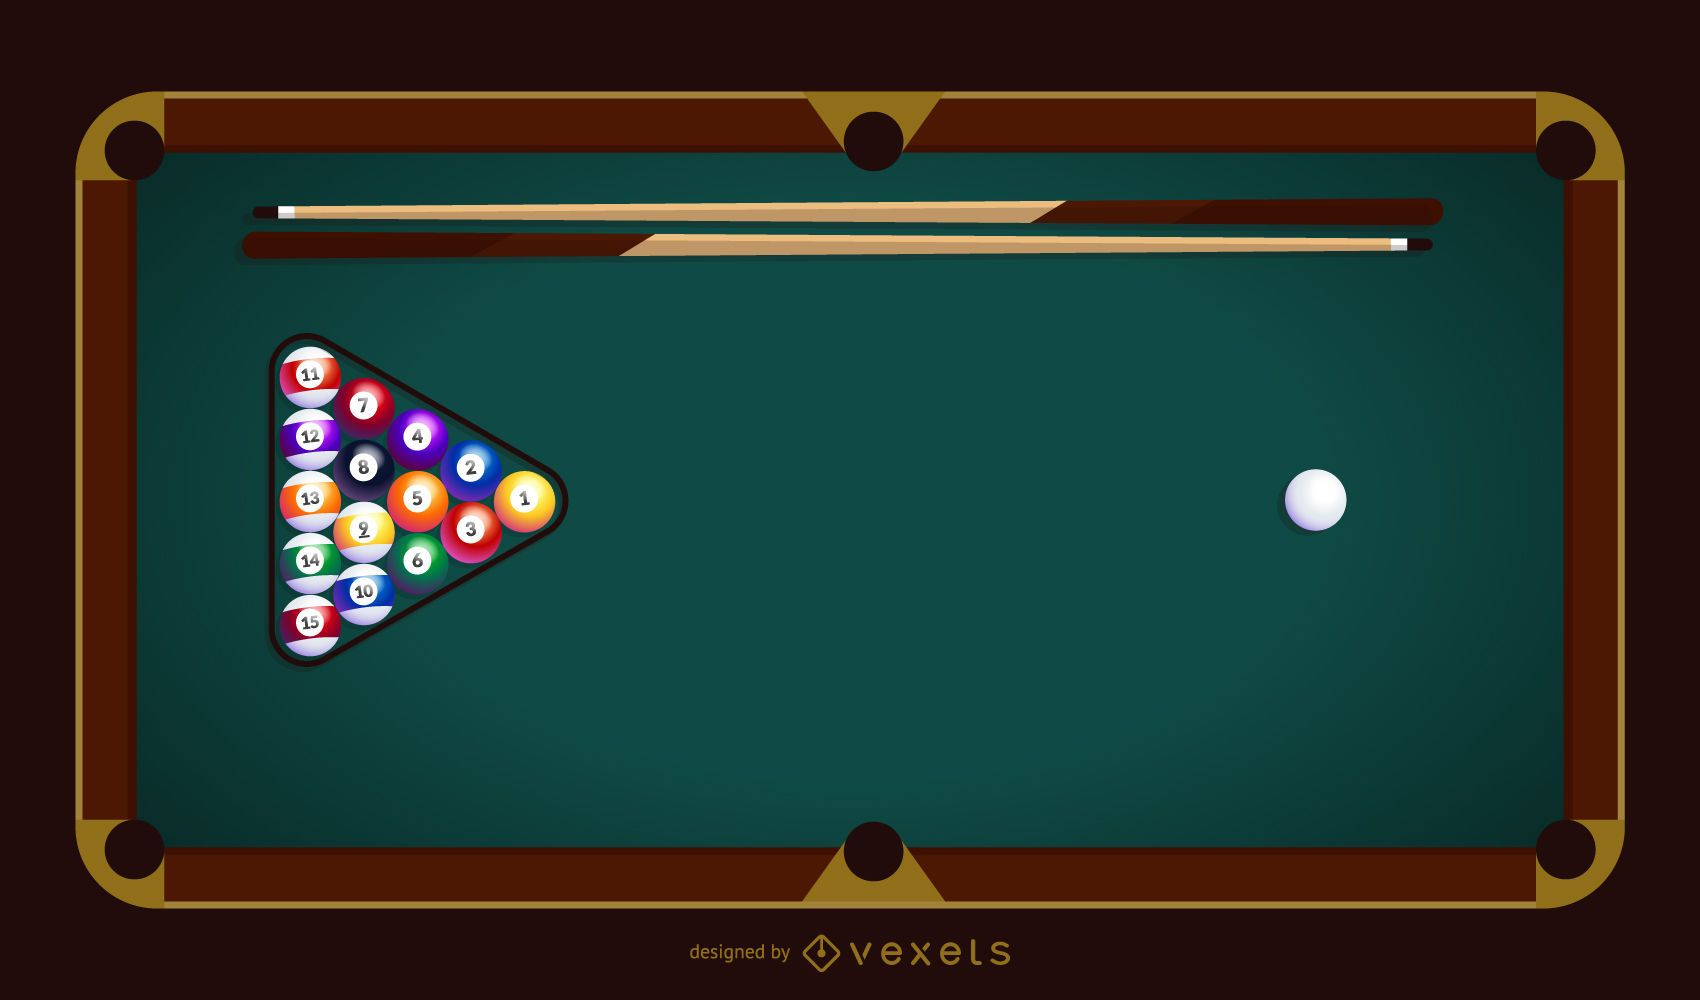 Billiard table vector illustration